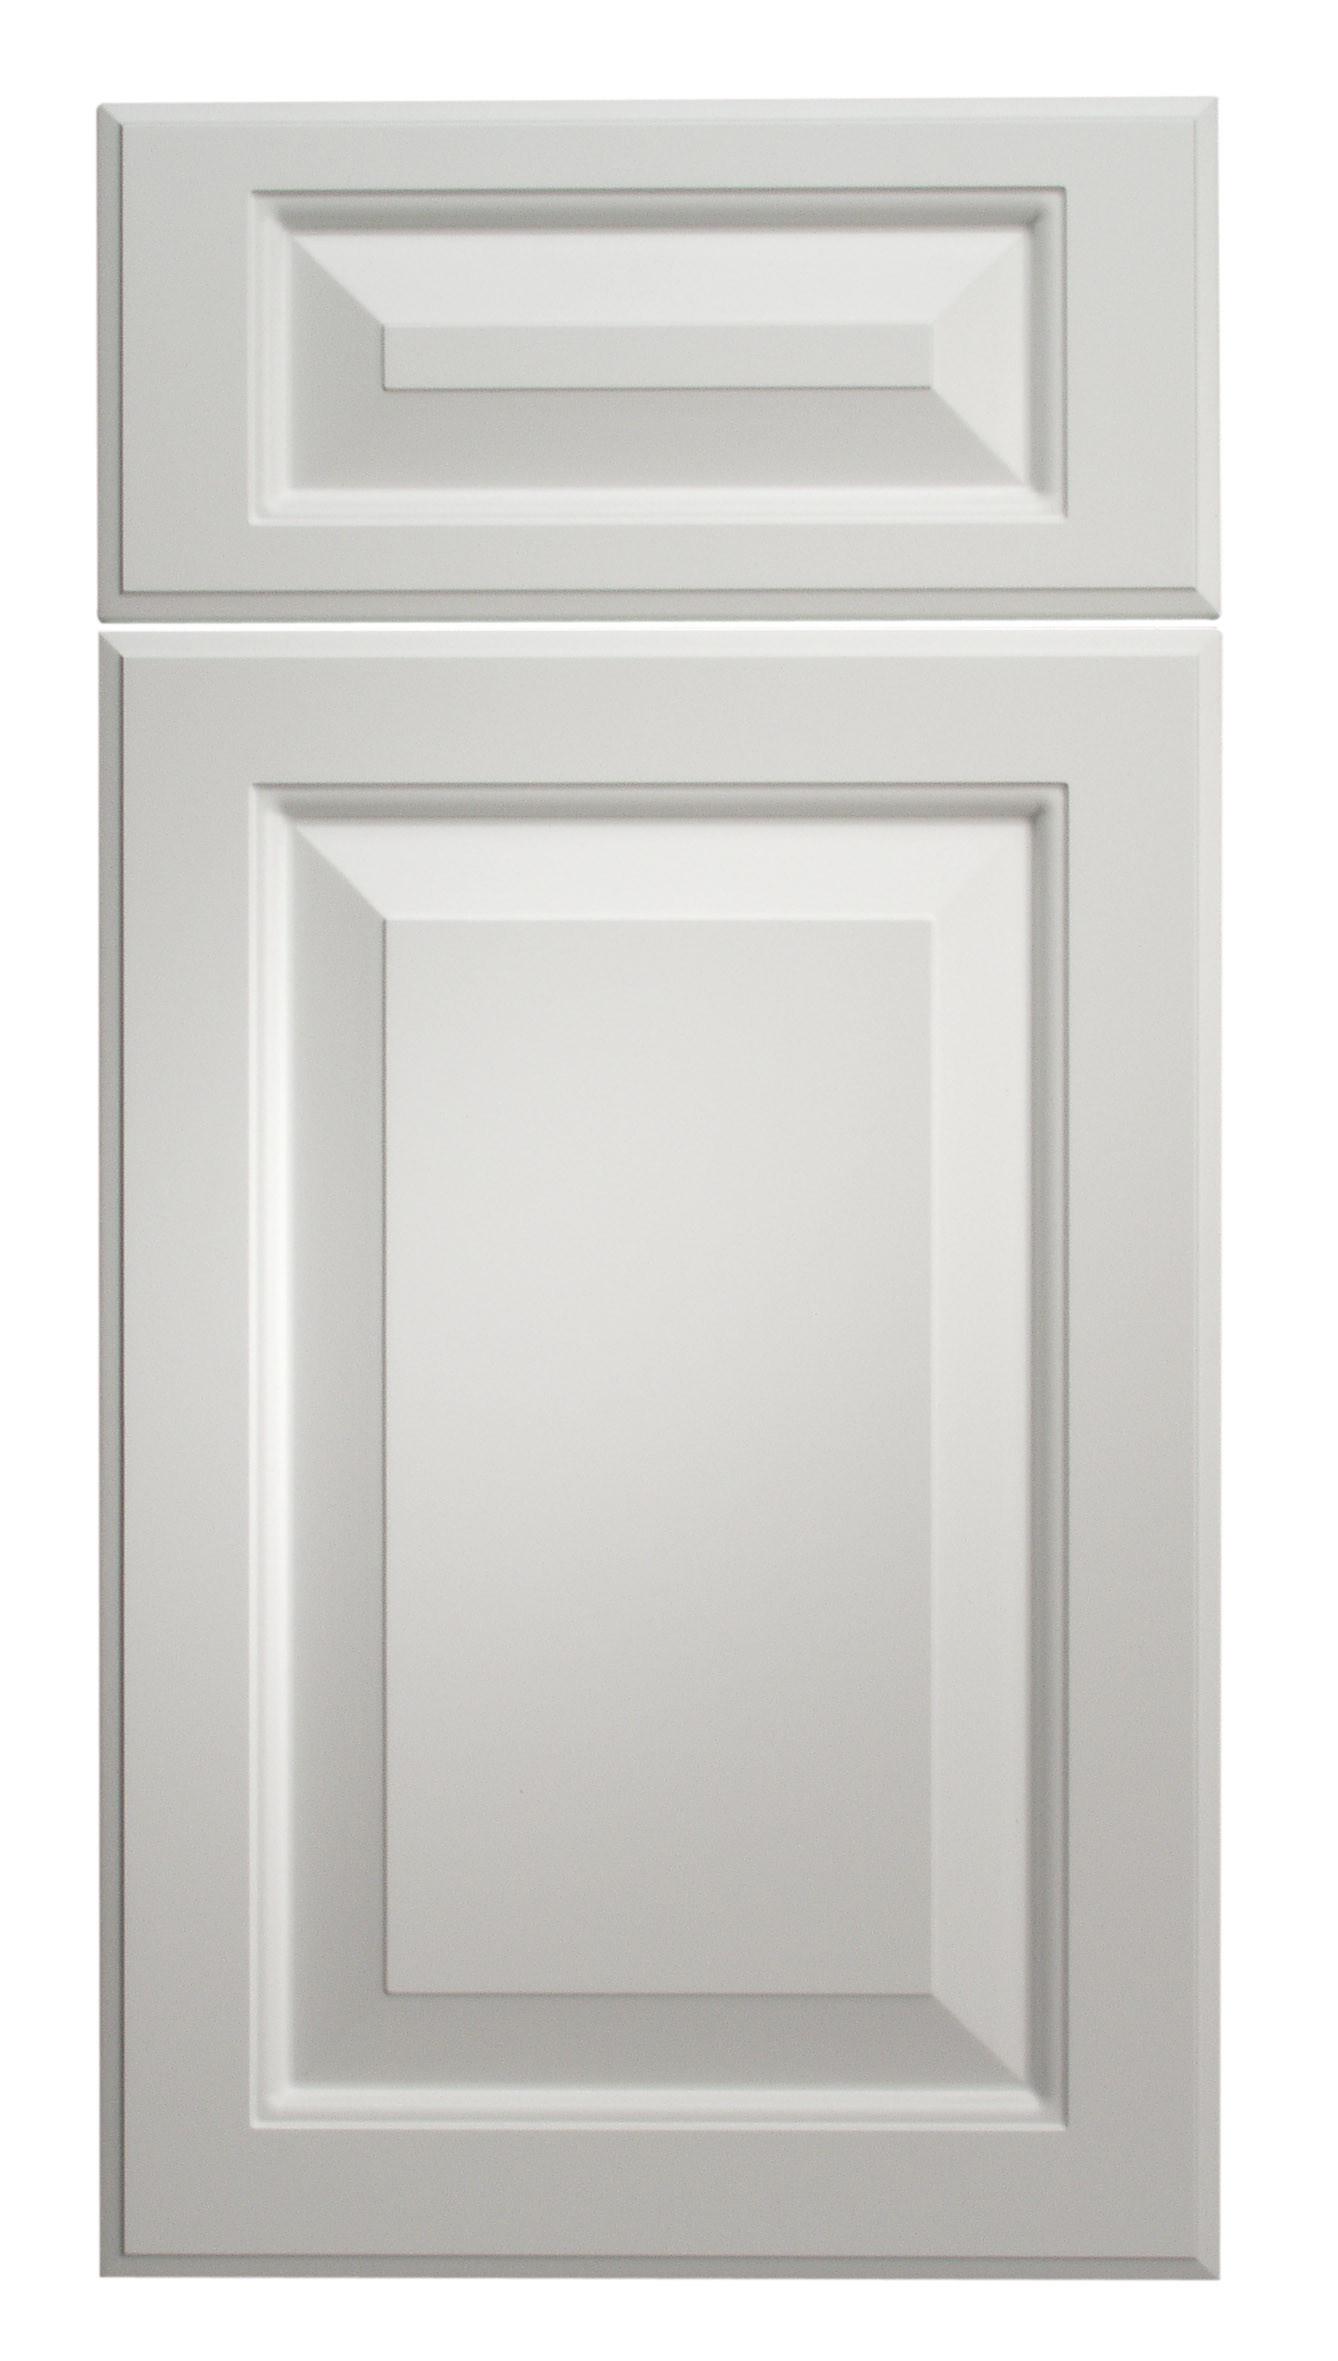 The Best Replacement Cabinet Doors Home Depot - Best ...